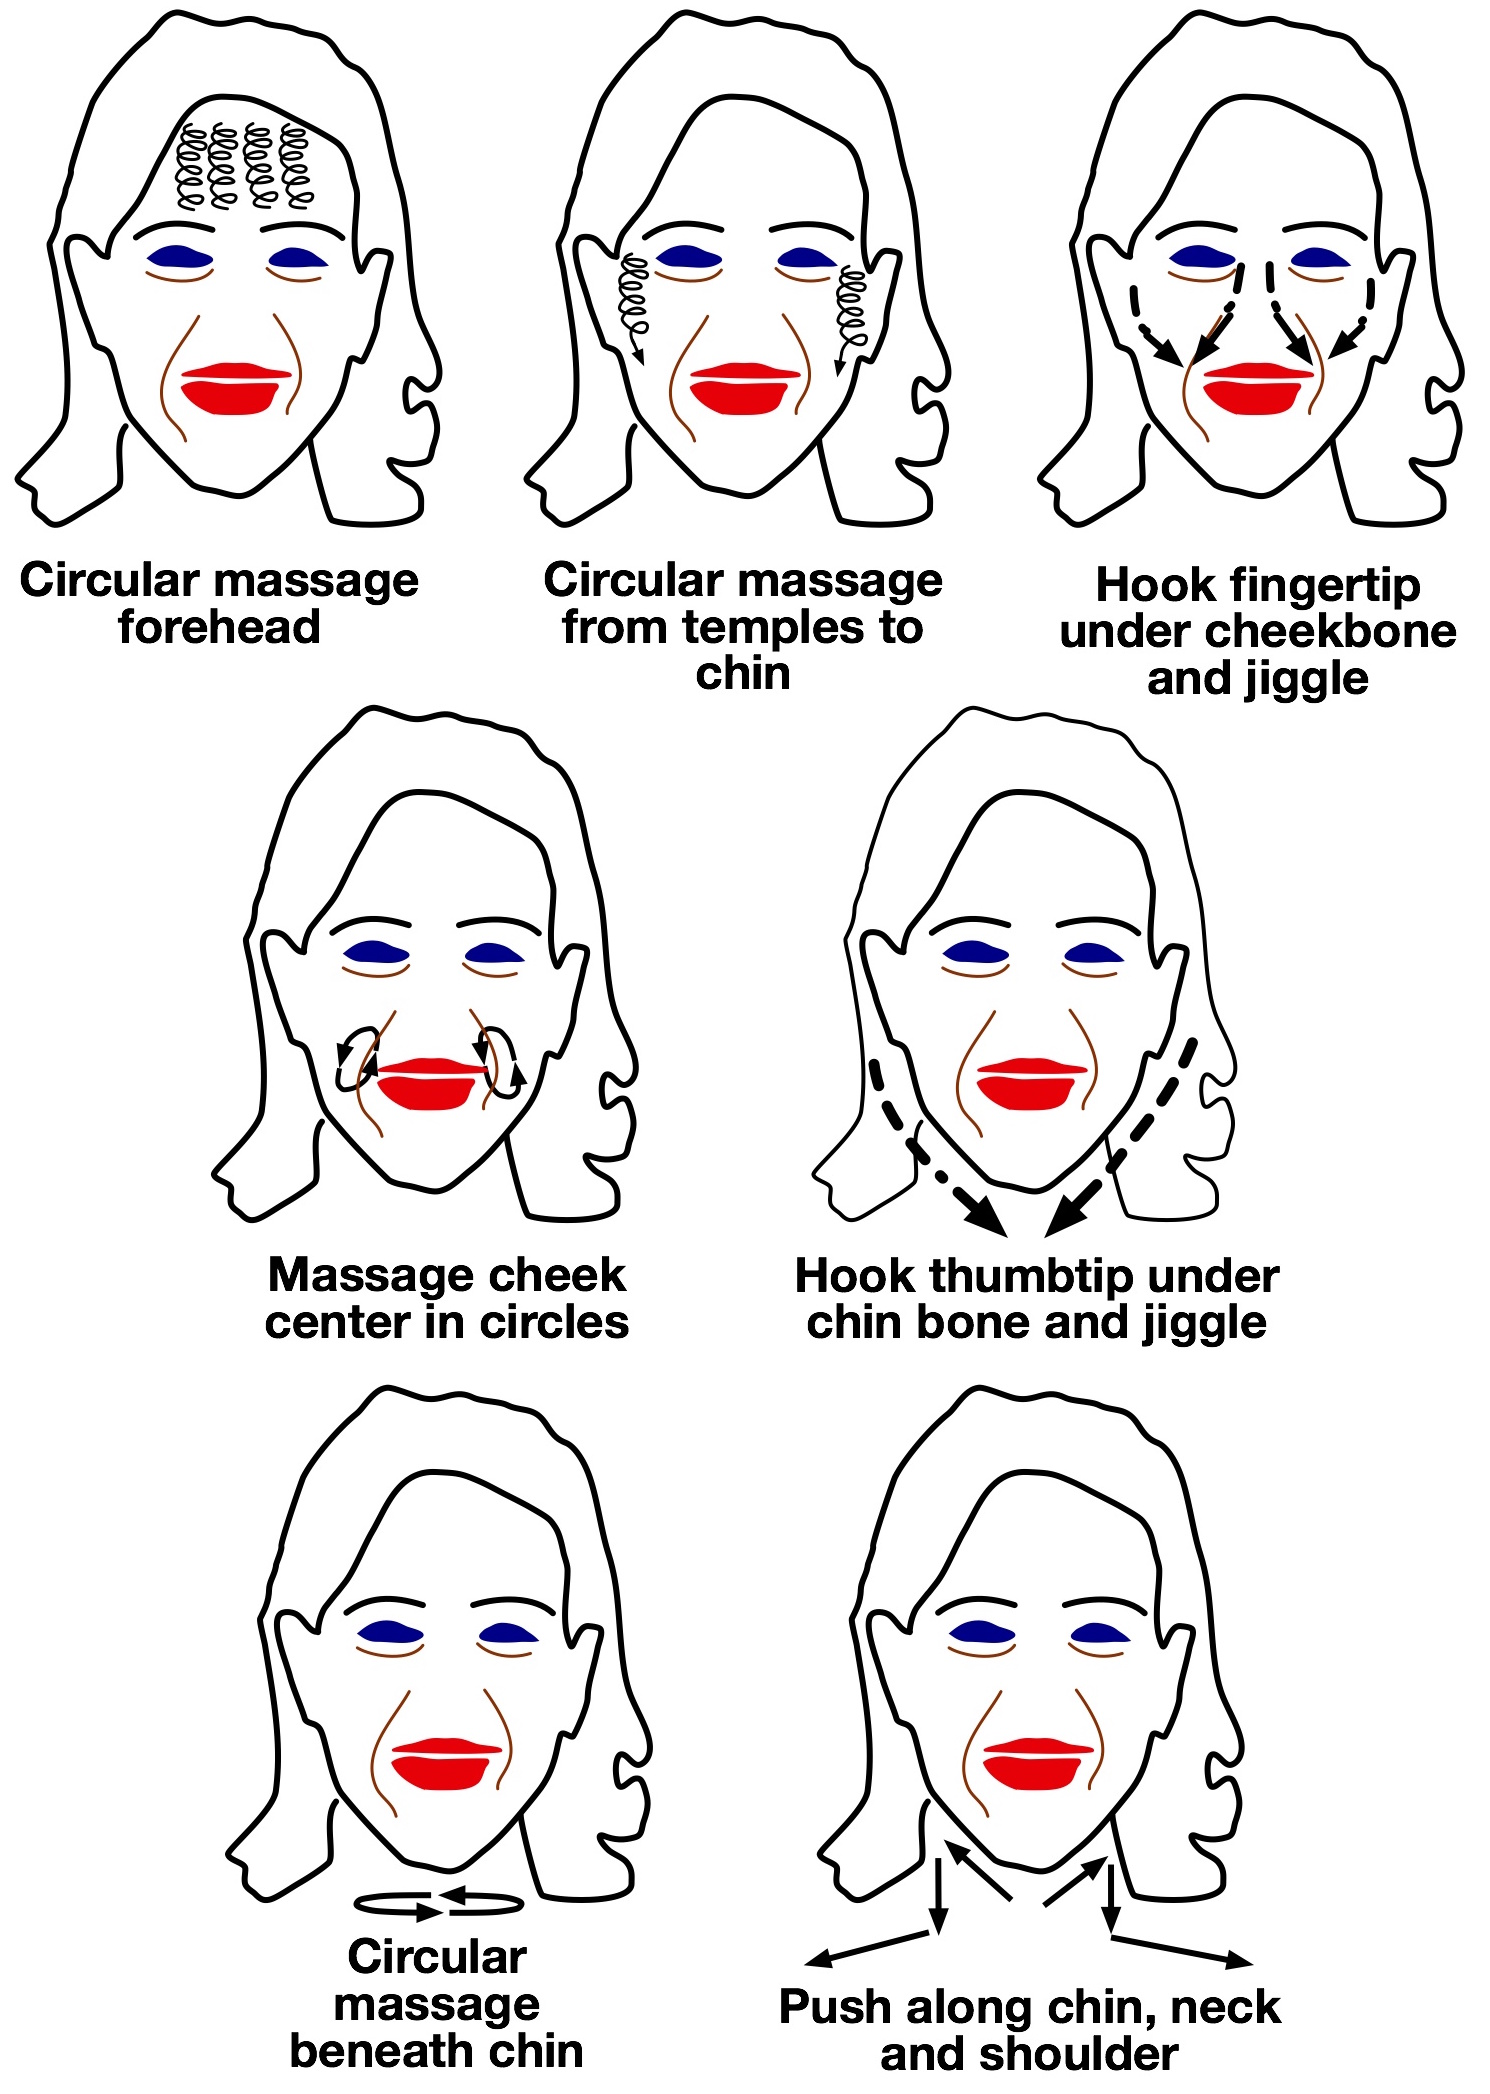 Facial lymphatic massage